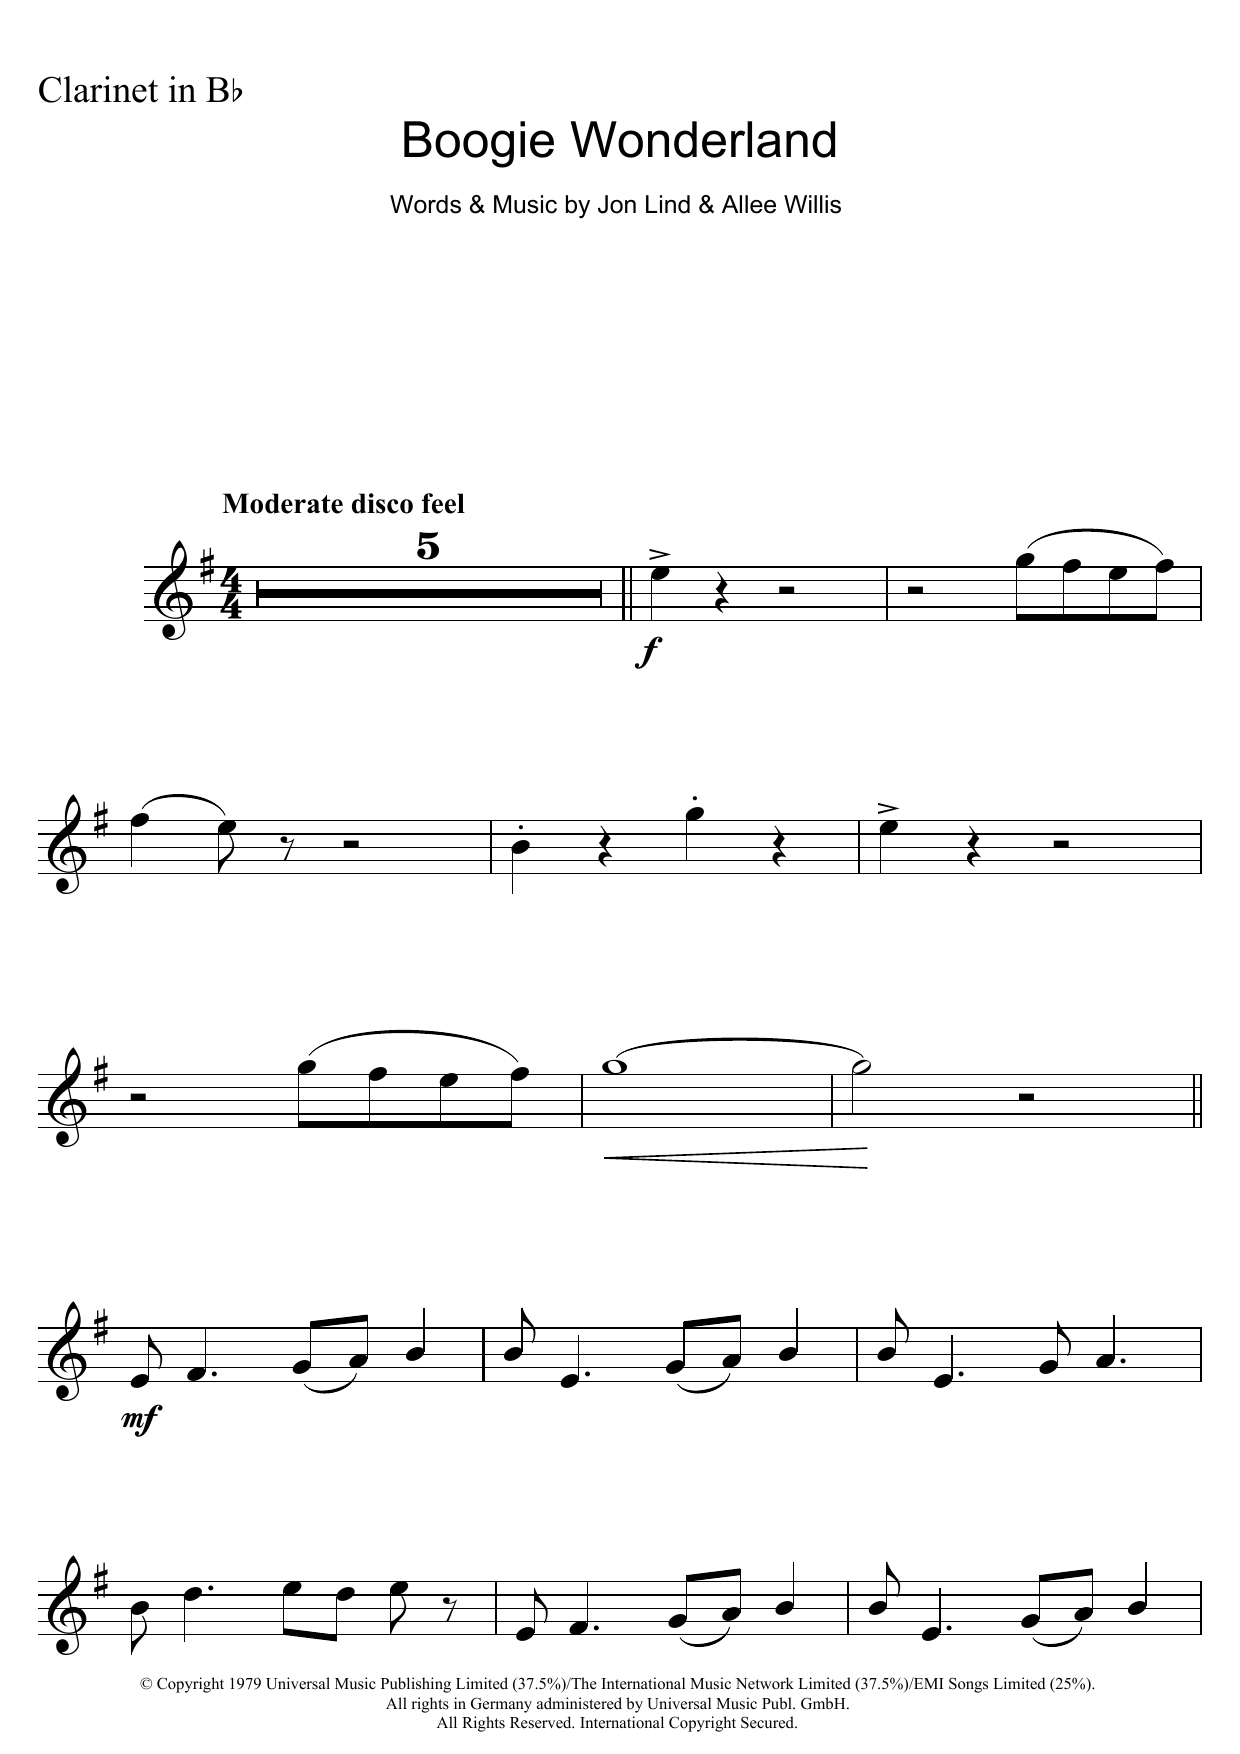 Boogie Wonderland Sheet Music